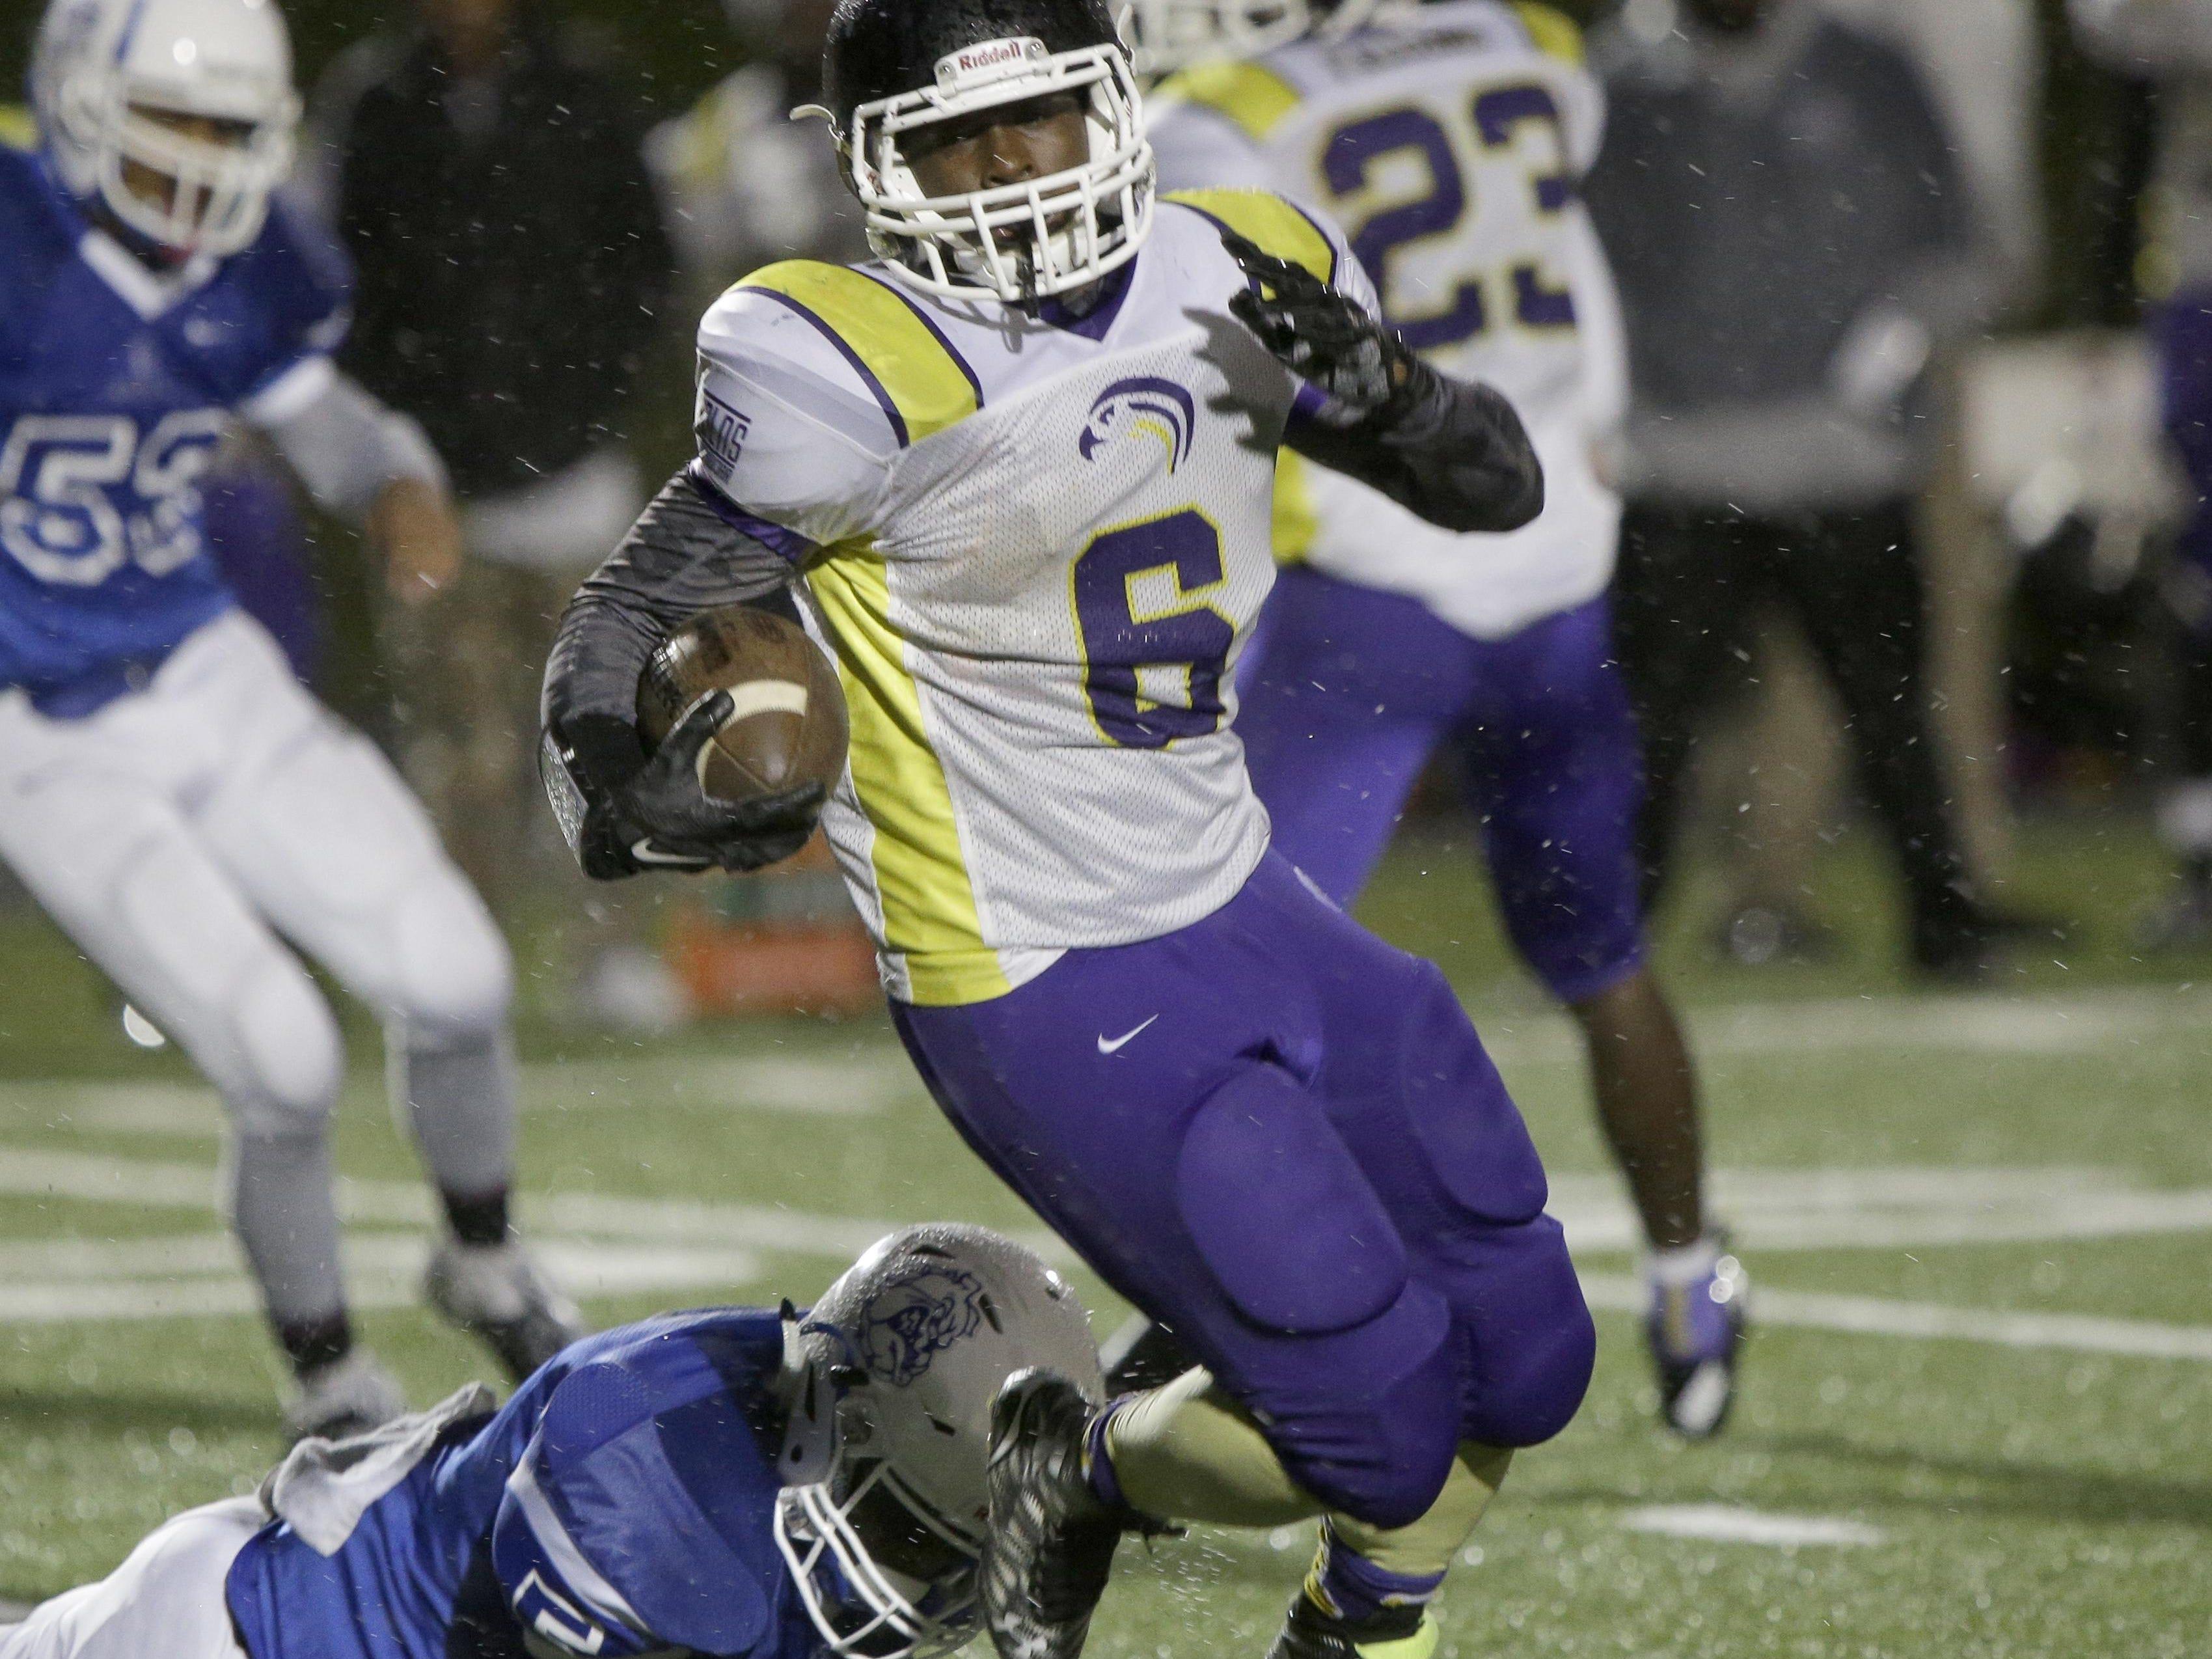 Aiken's Demonte Reece runs the ball during the Falcons' football game against Woodward Oct. 3.